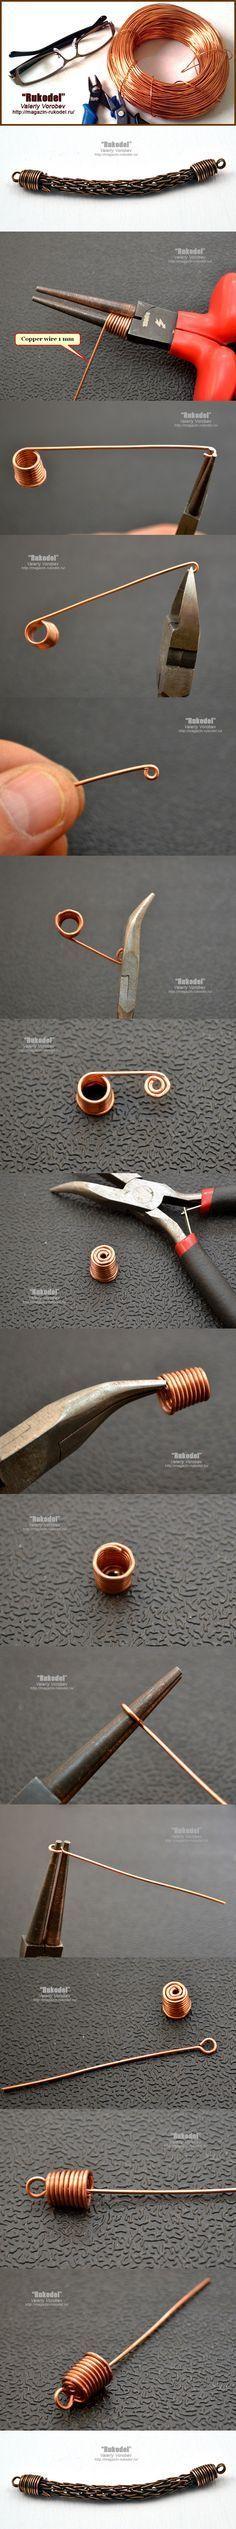 Tutorial DIY Wire Jewelry Image Description Caps of copper wire Концевики для бижутерии своими руками. | Рукодел